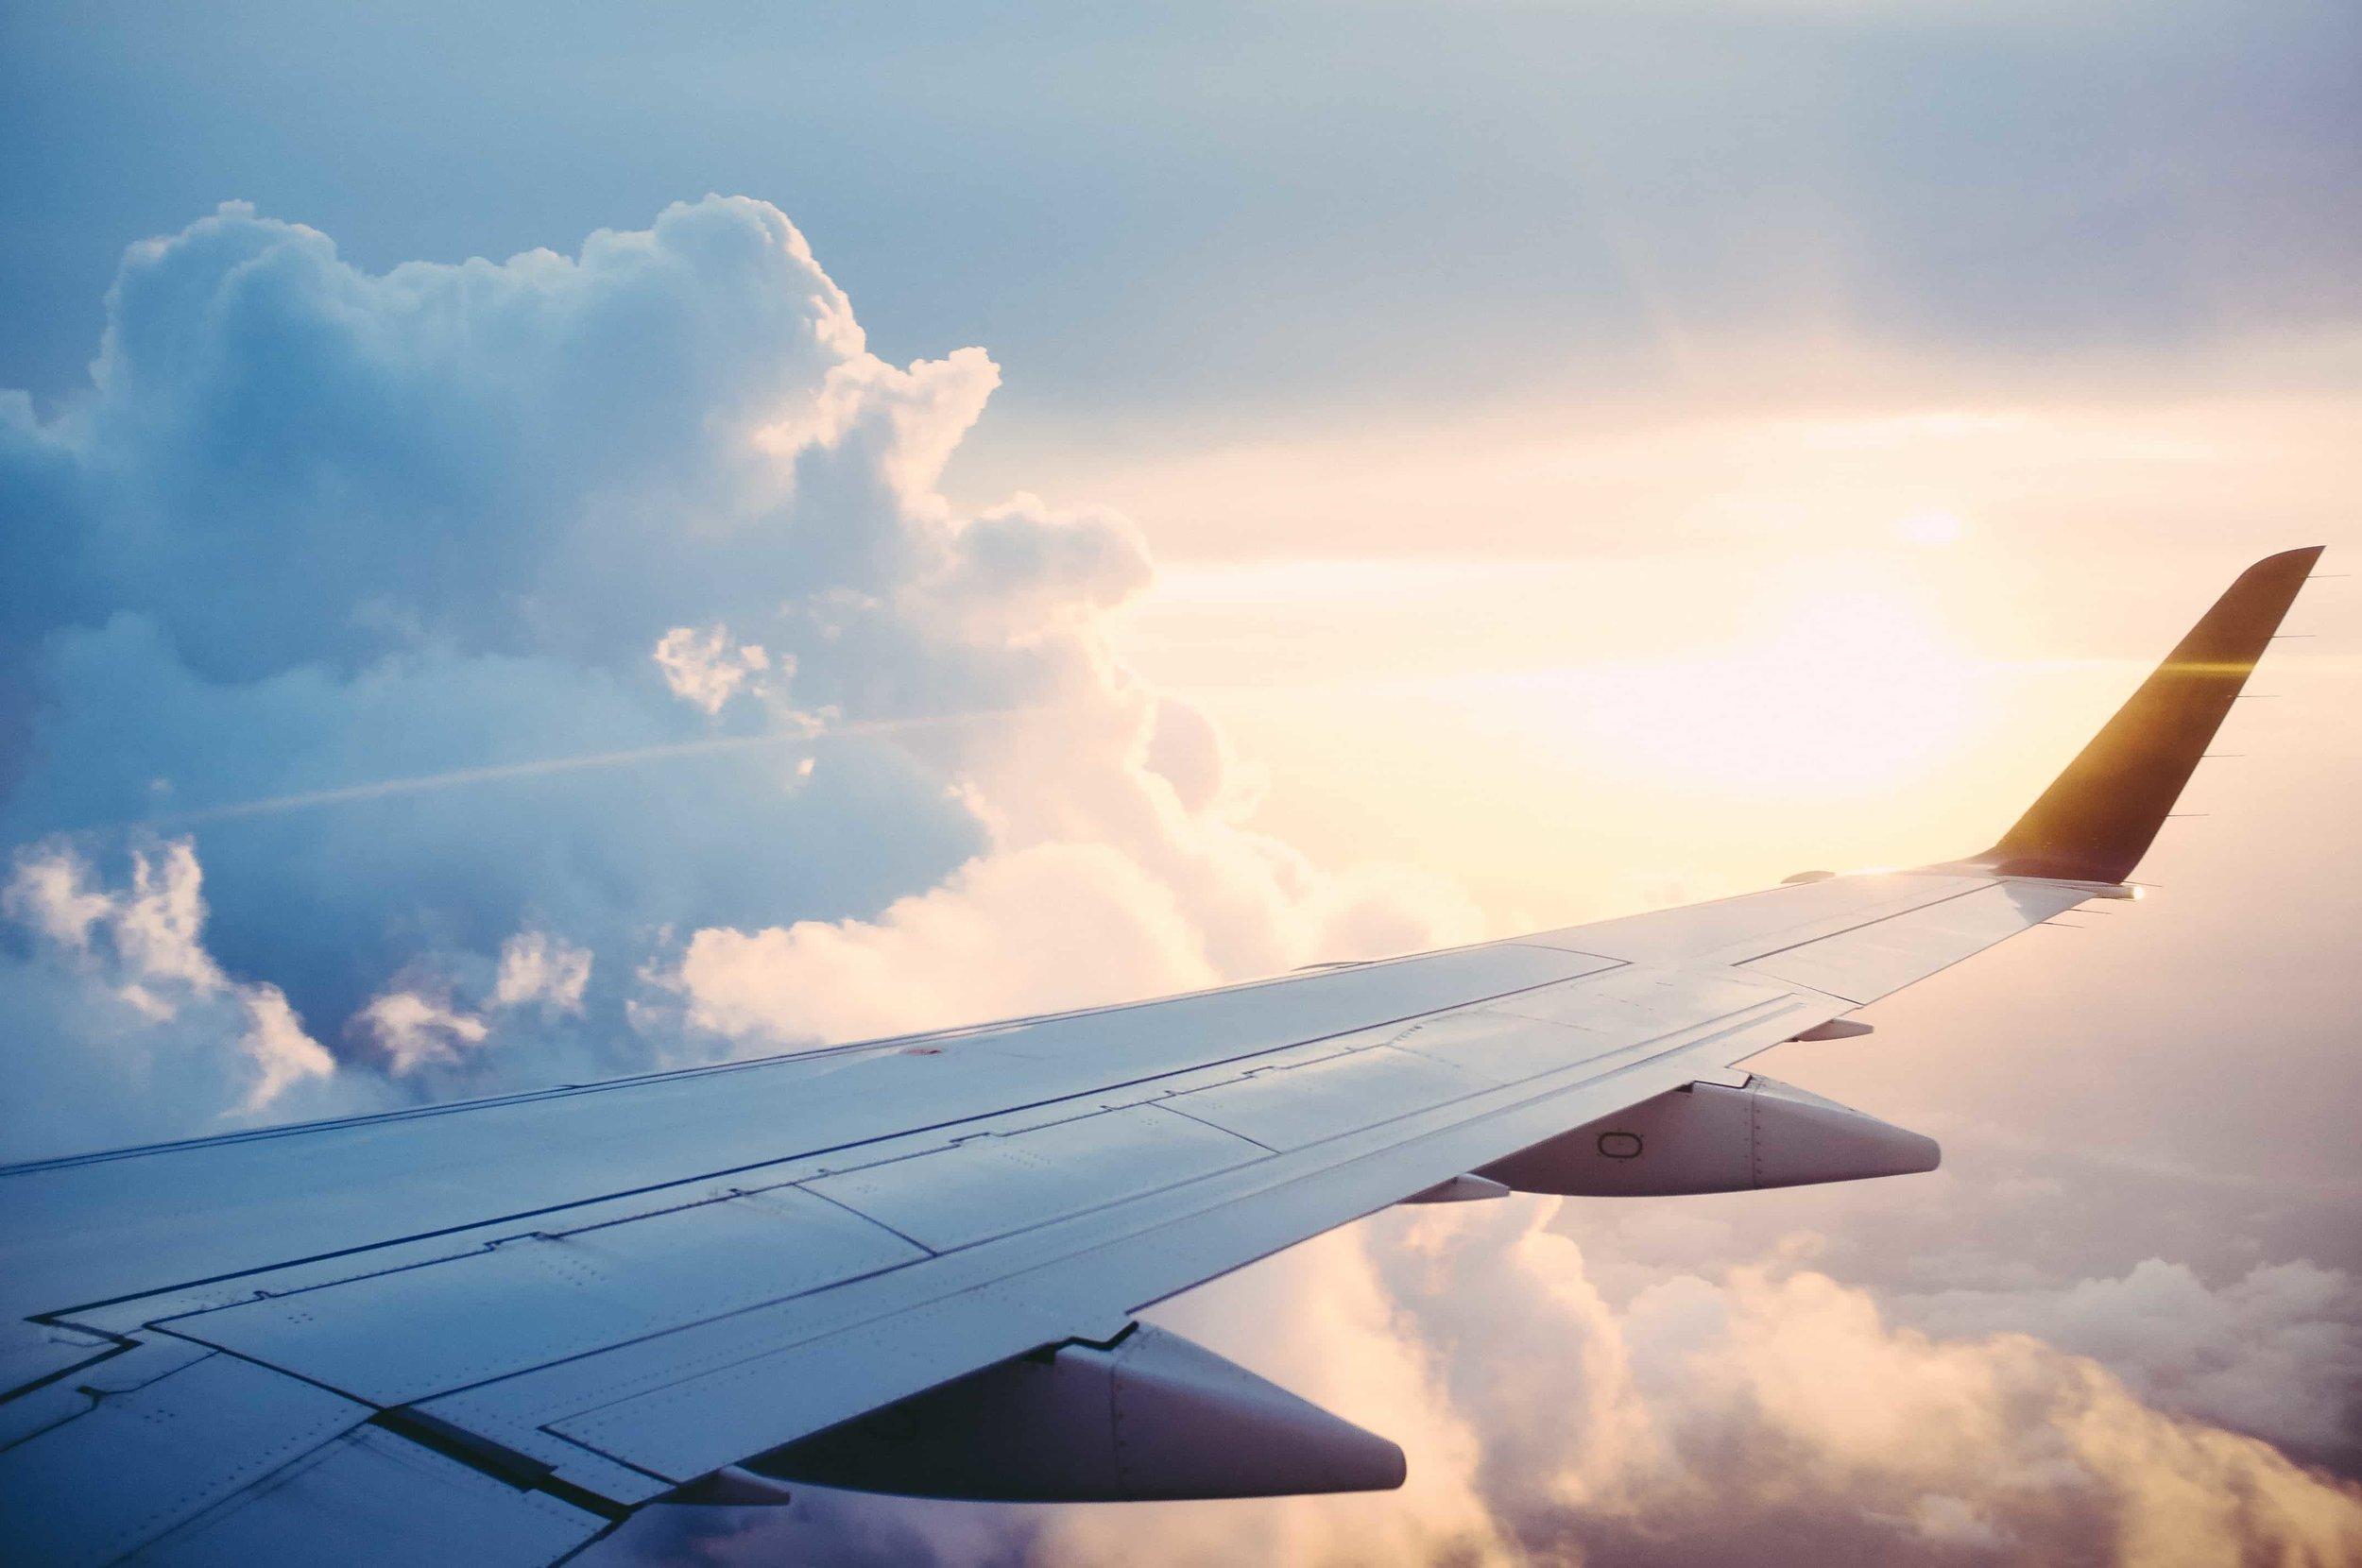 airplane-wing-sun-min.jpg